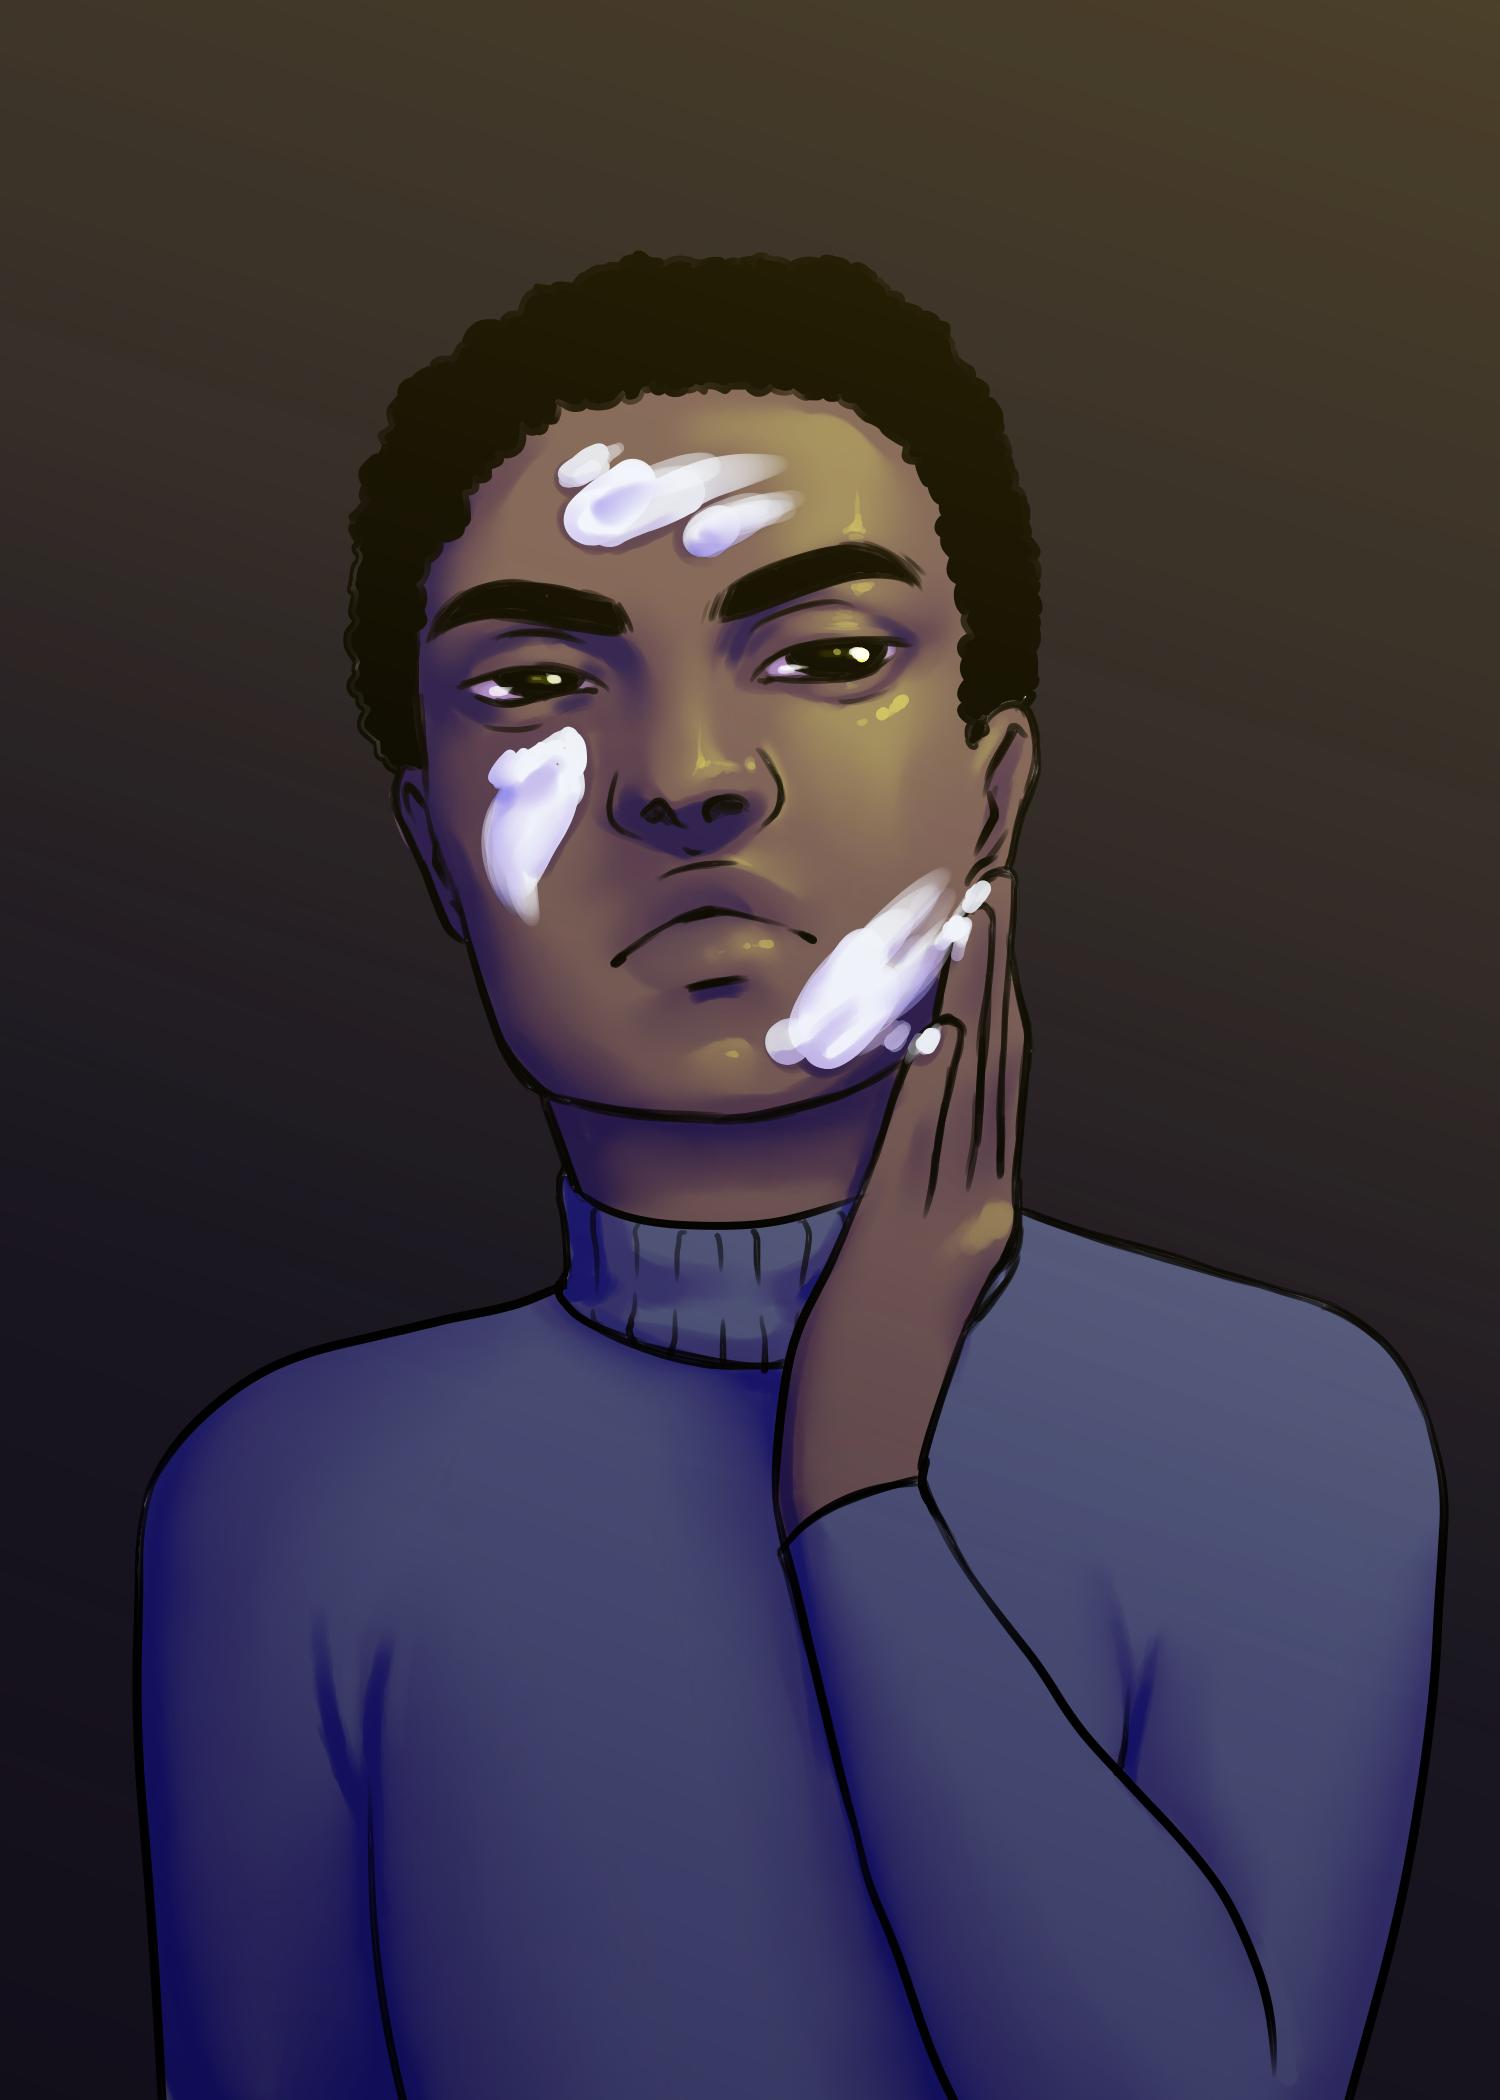 A digital illustration of a man